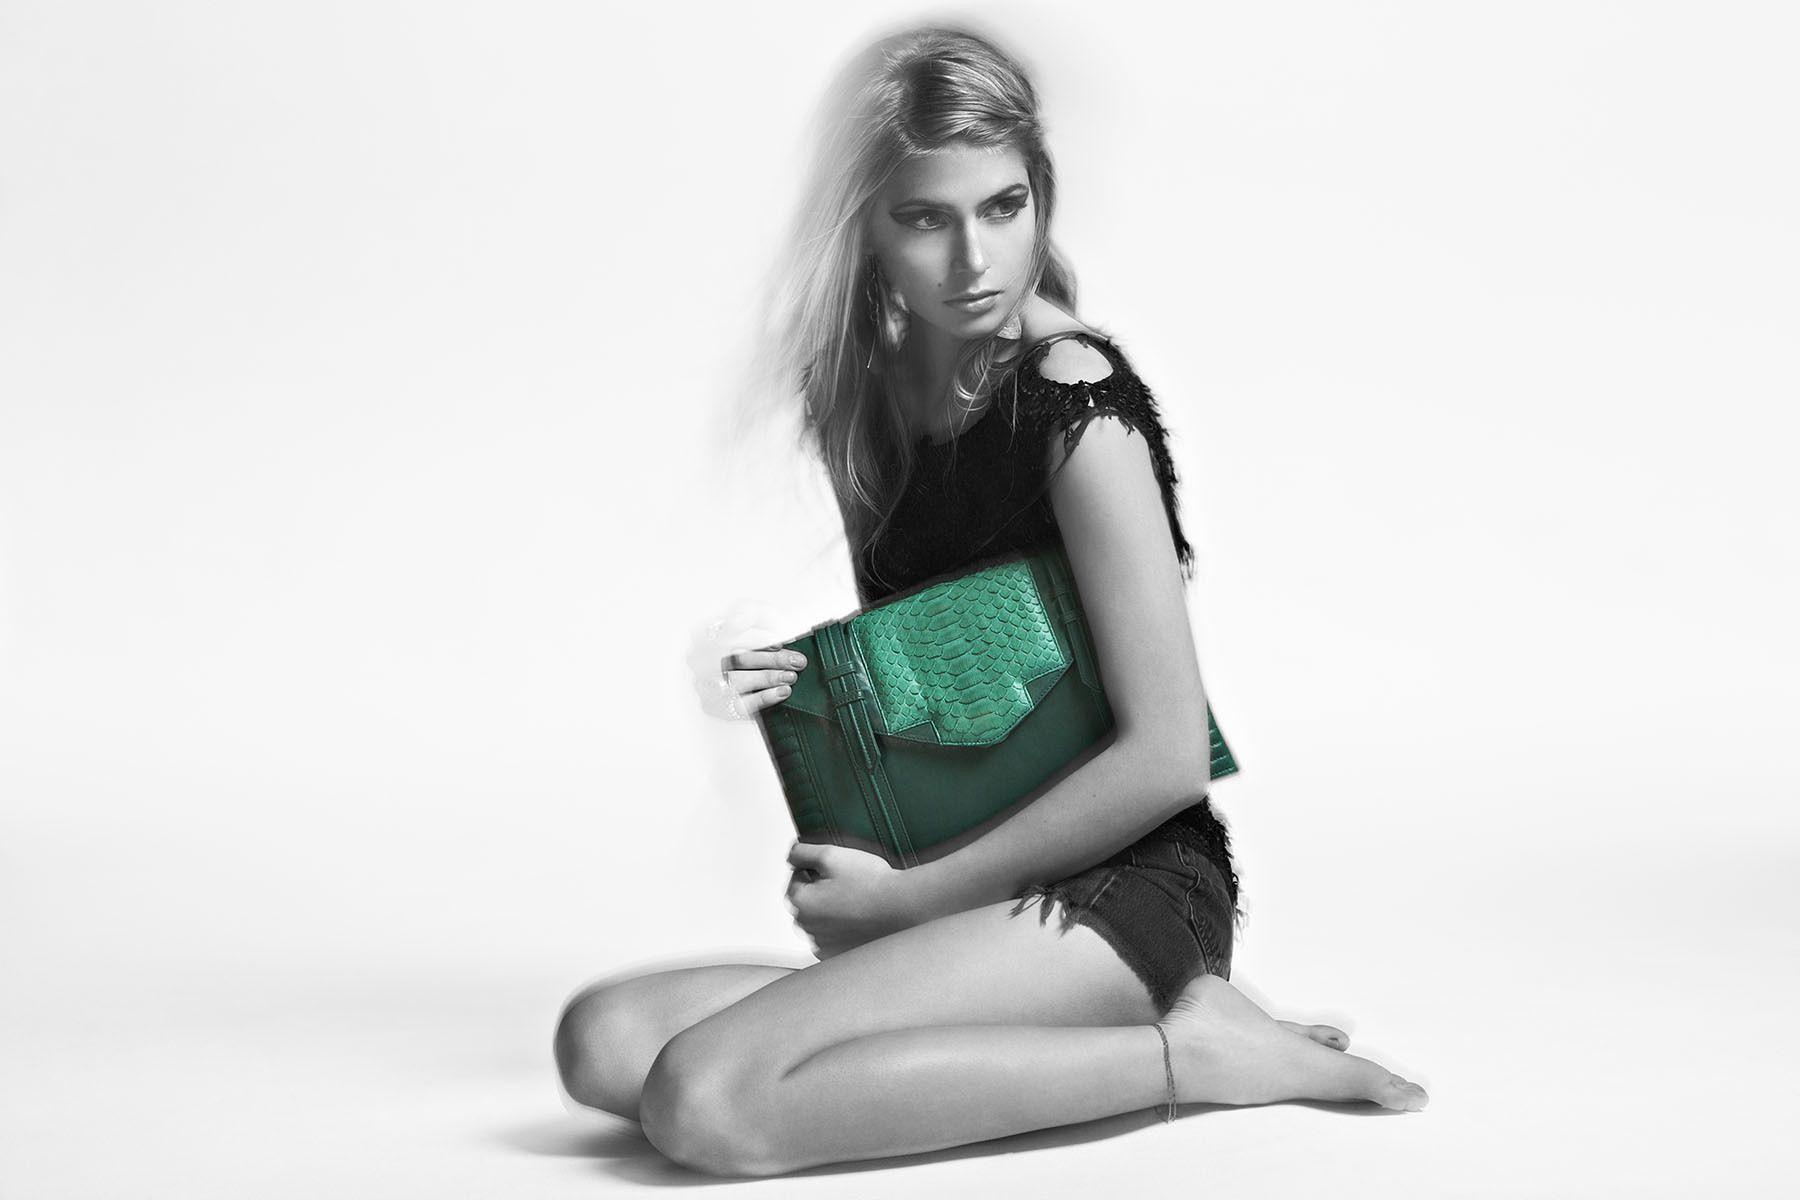 Model: Annie McGinty